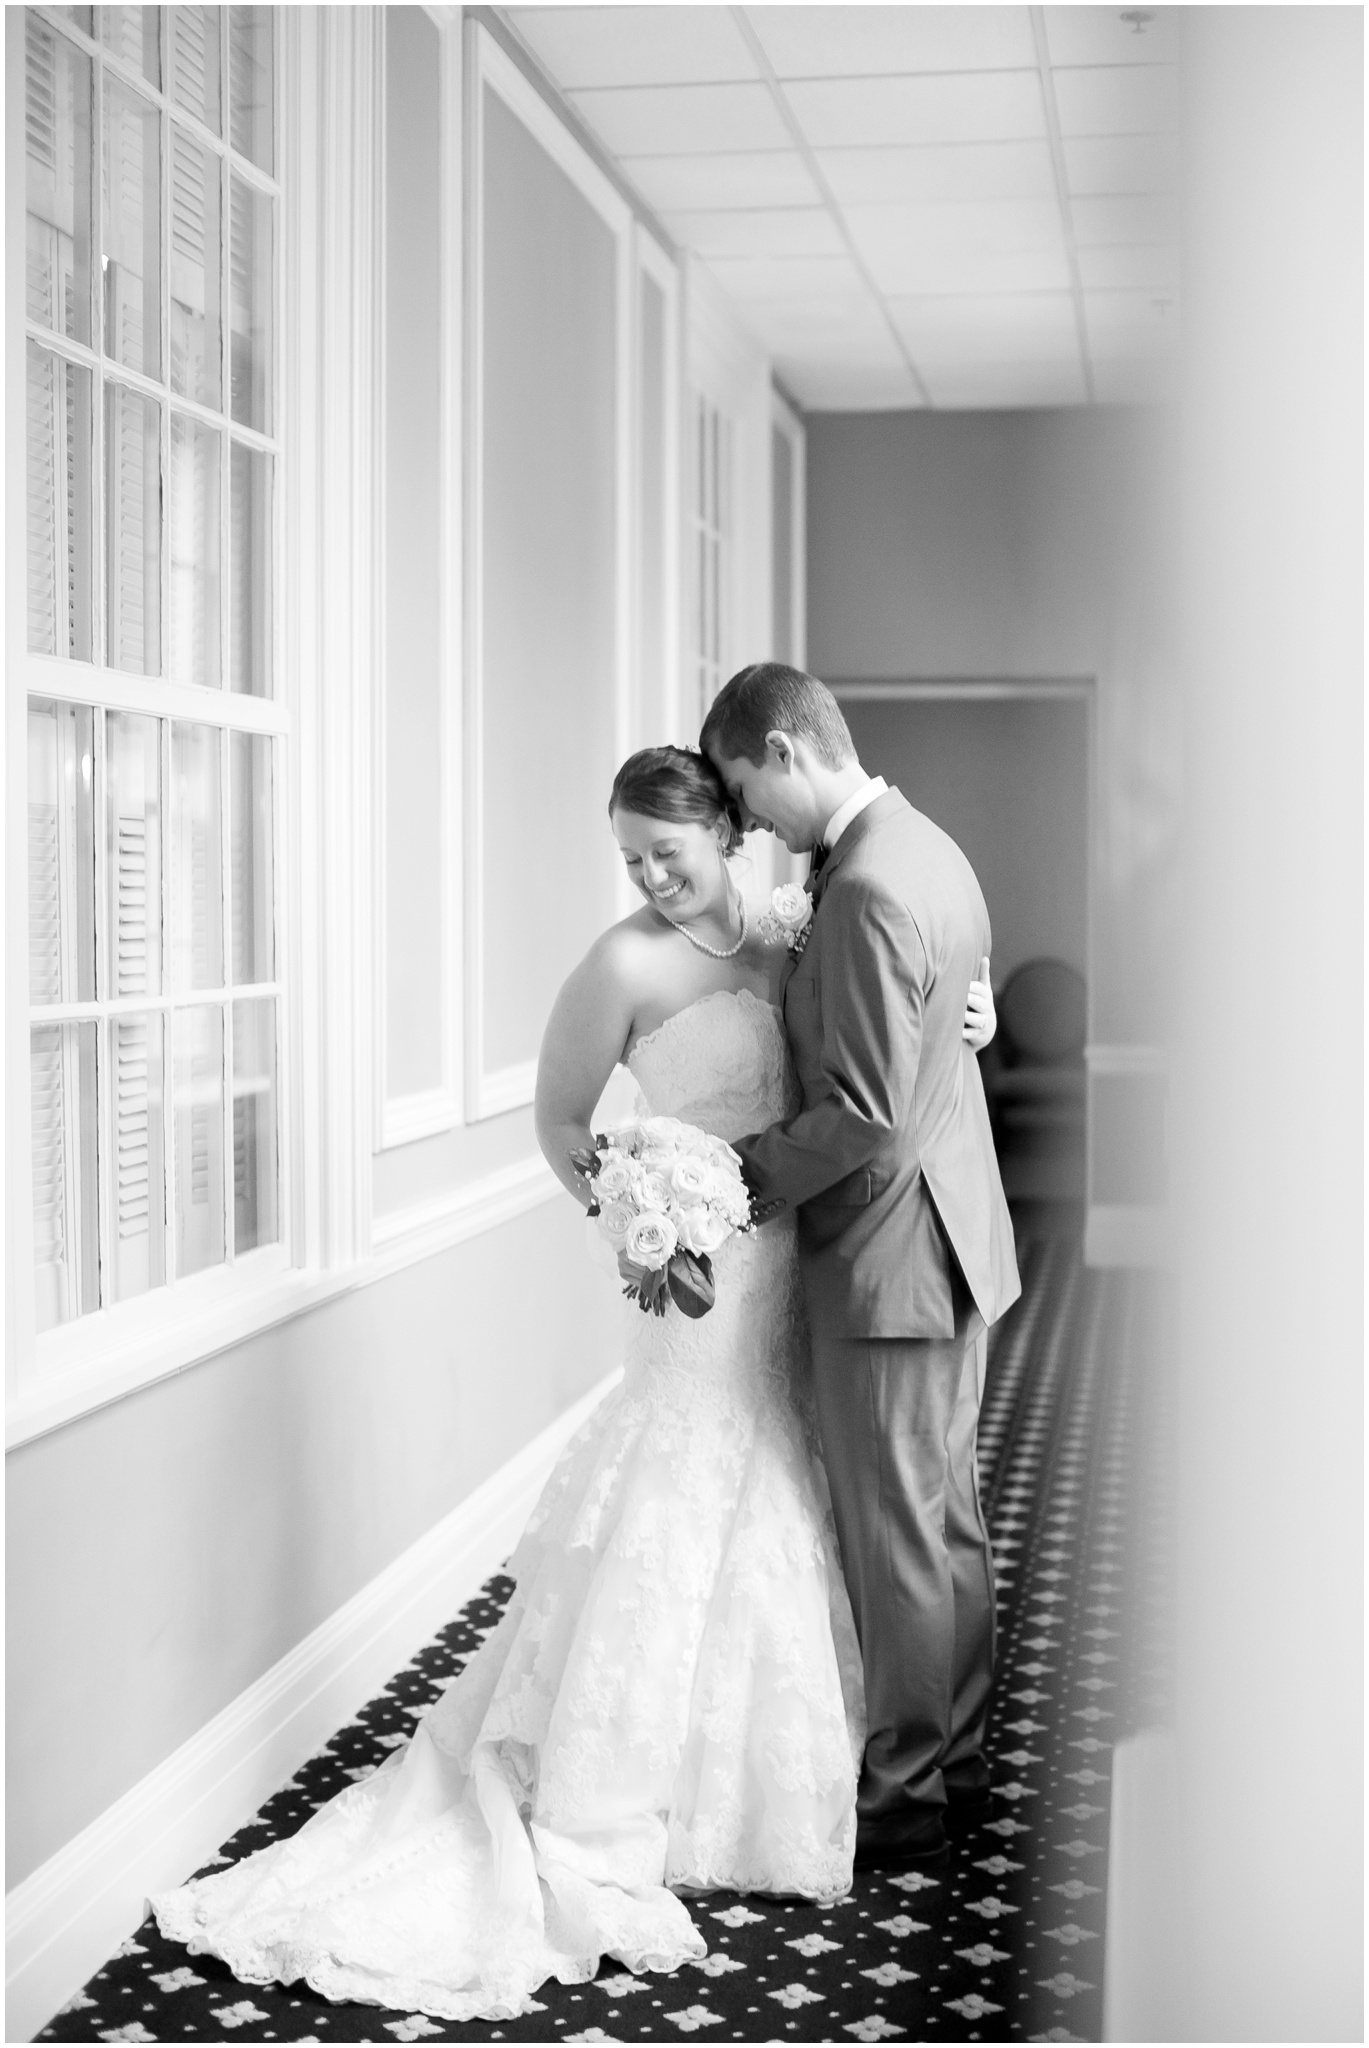 Madison_Club_Madison_Wisconsin_Wedding_Photographer_Spring_Rainy_Wedding_2637.jpg